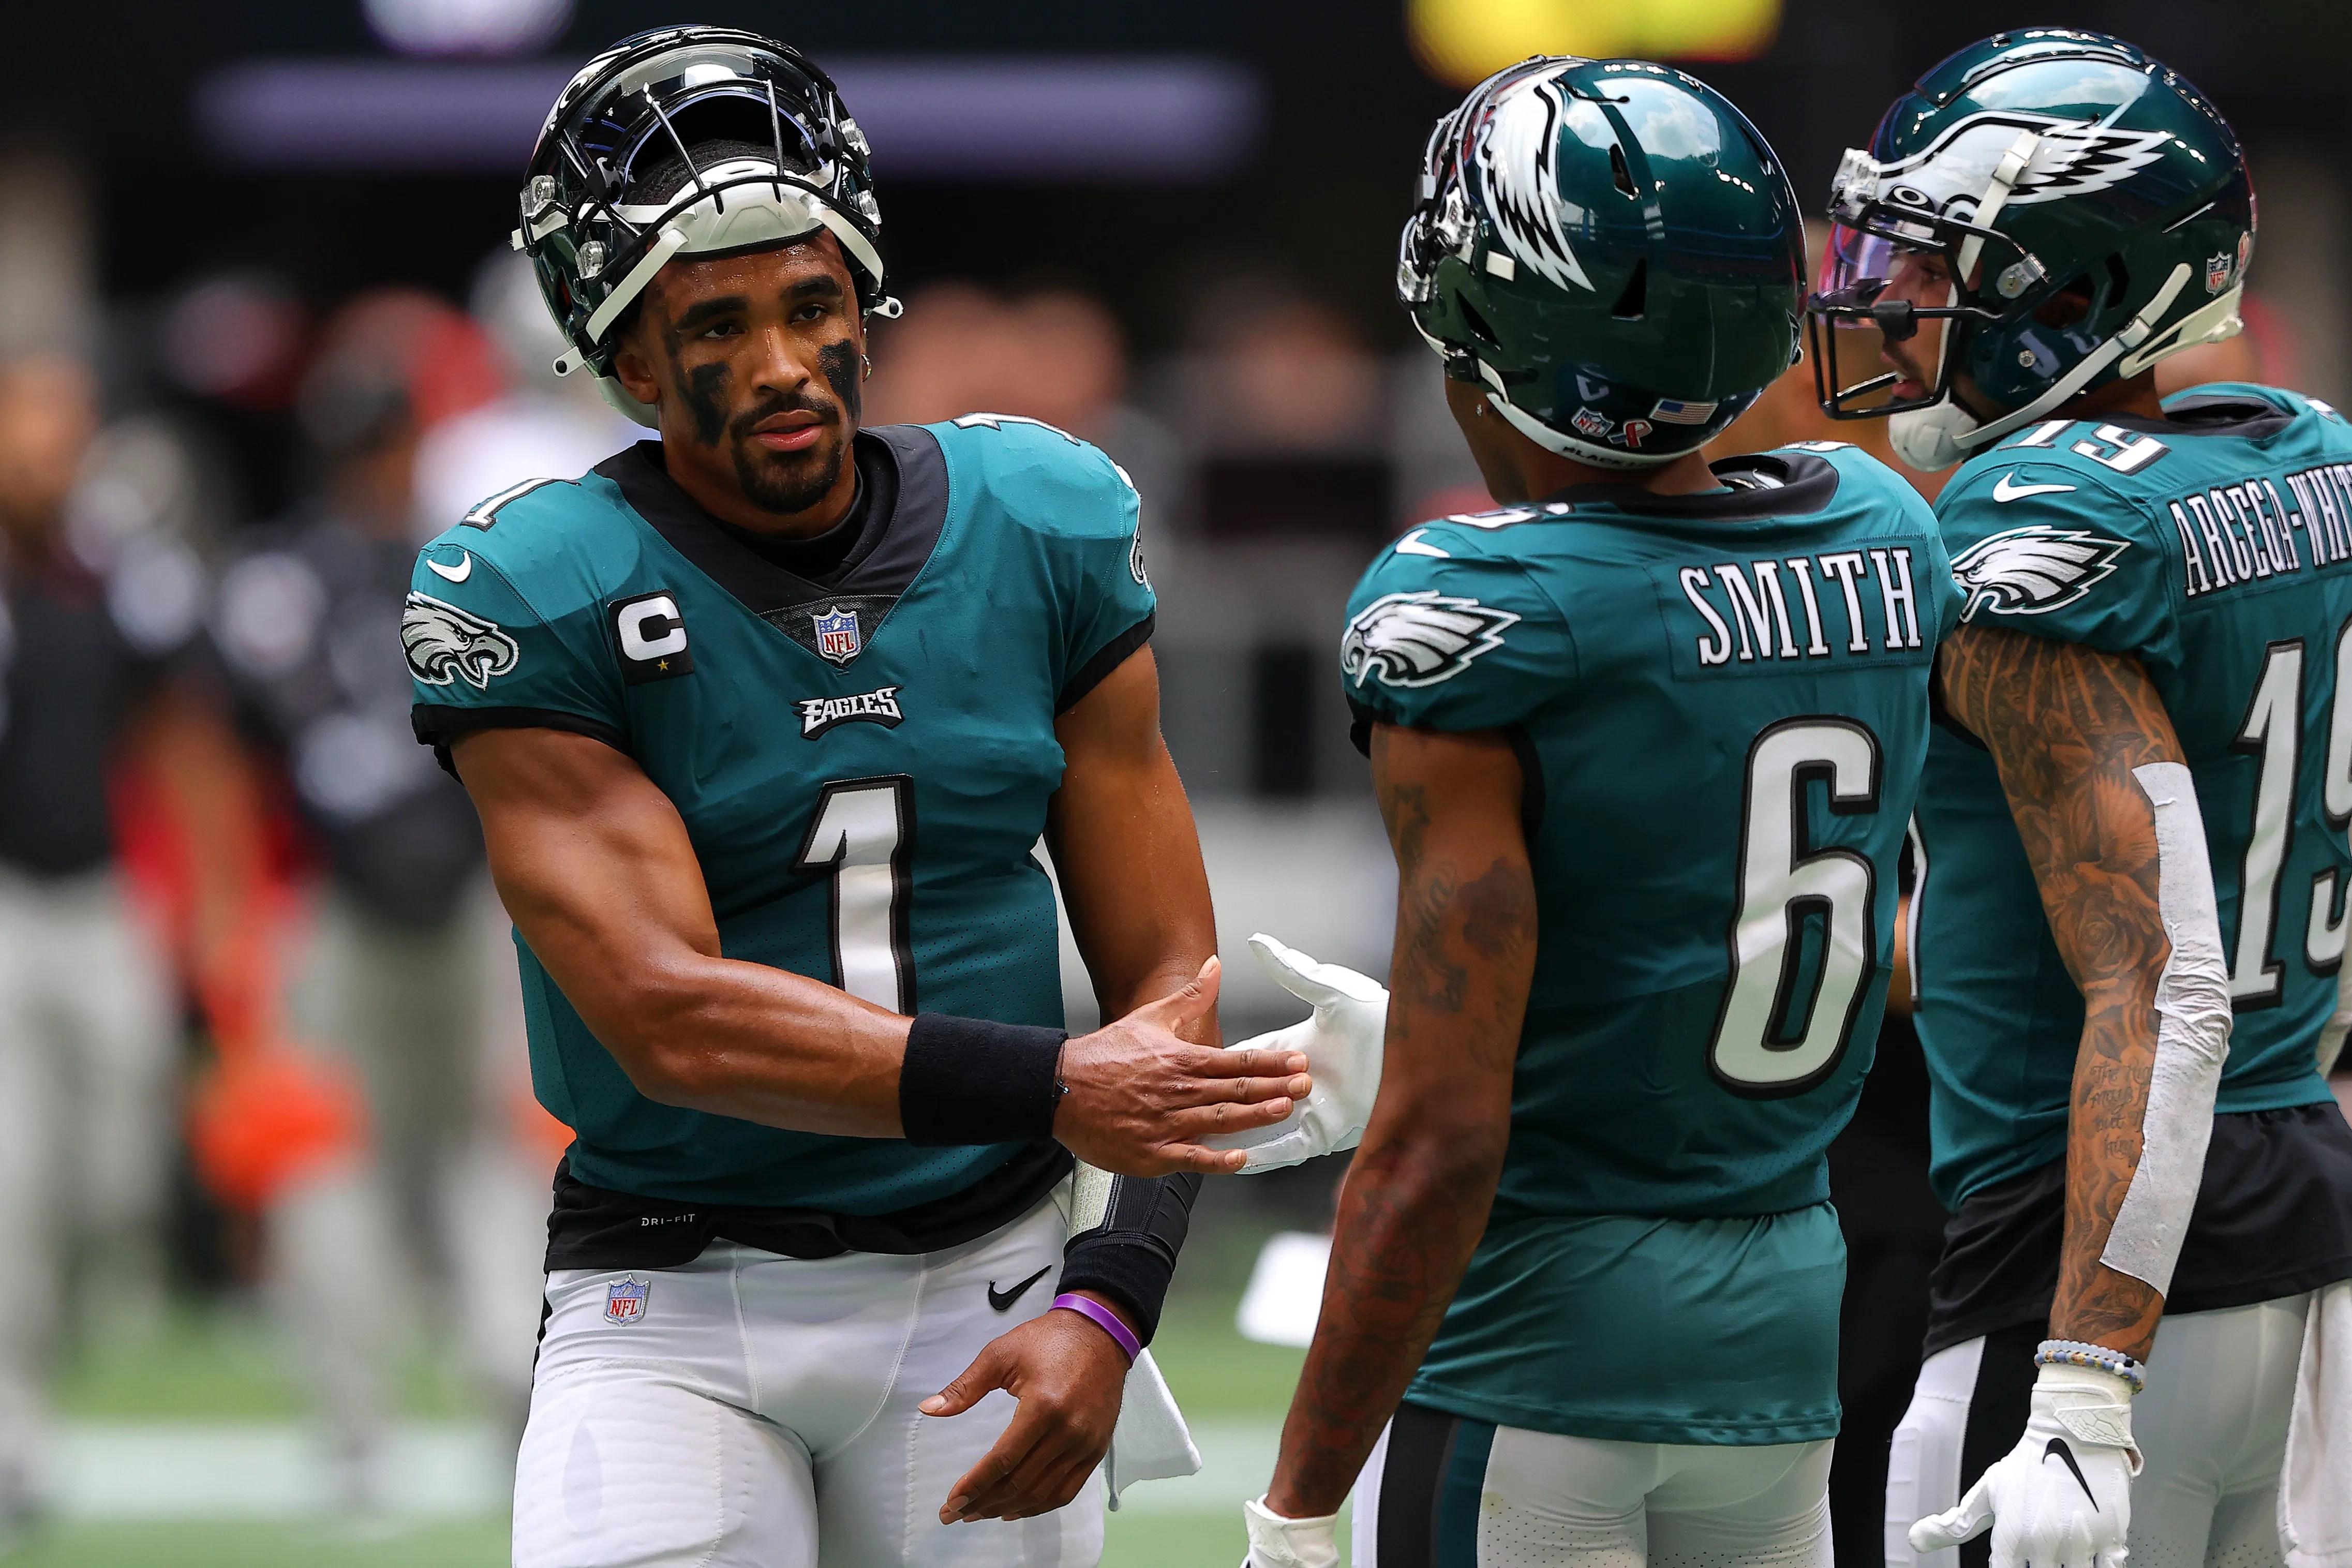 Quarterback Jalen Hurts, left, and wide receiver  DeVonta Smith showed some instant chemistry in the Eagles' opener.